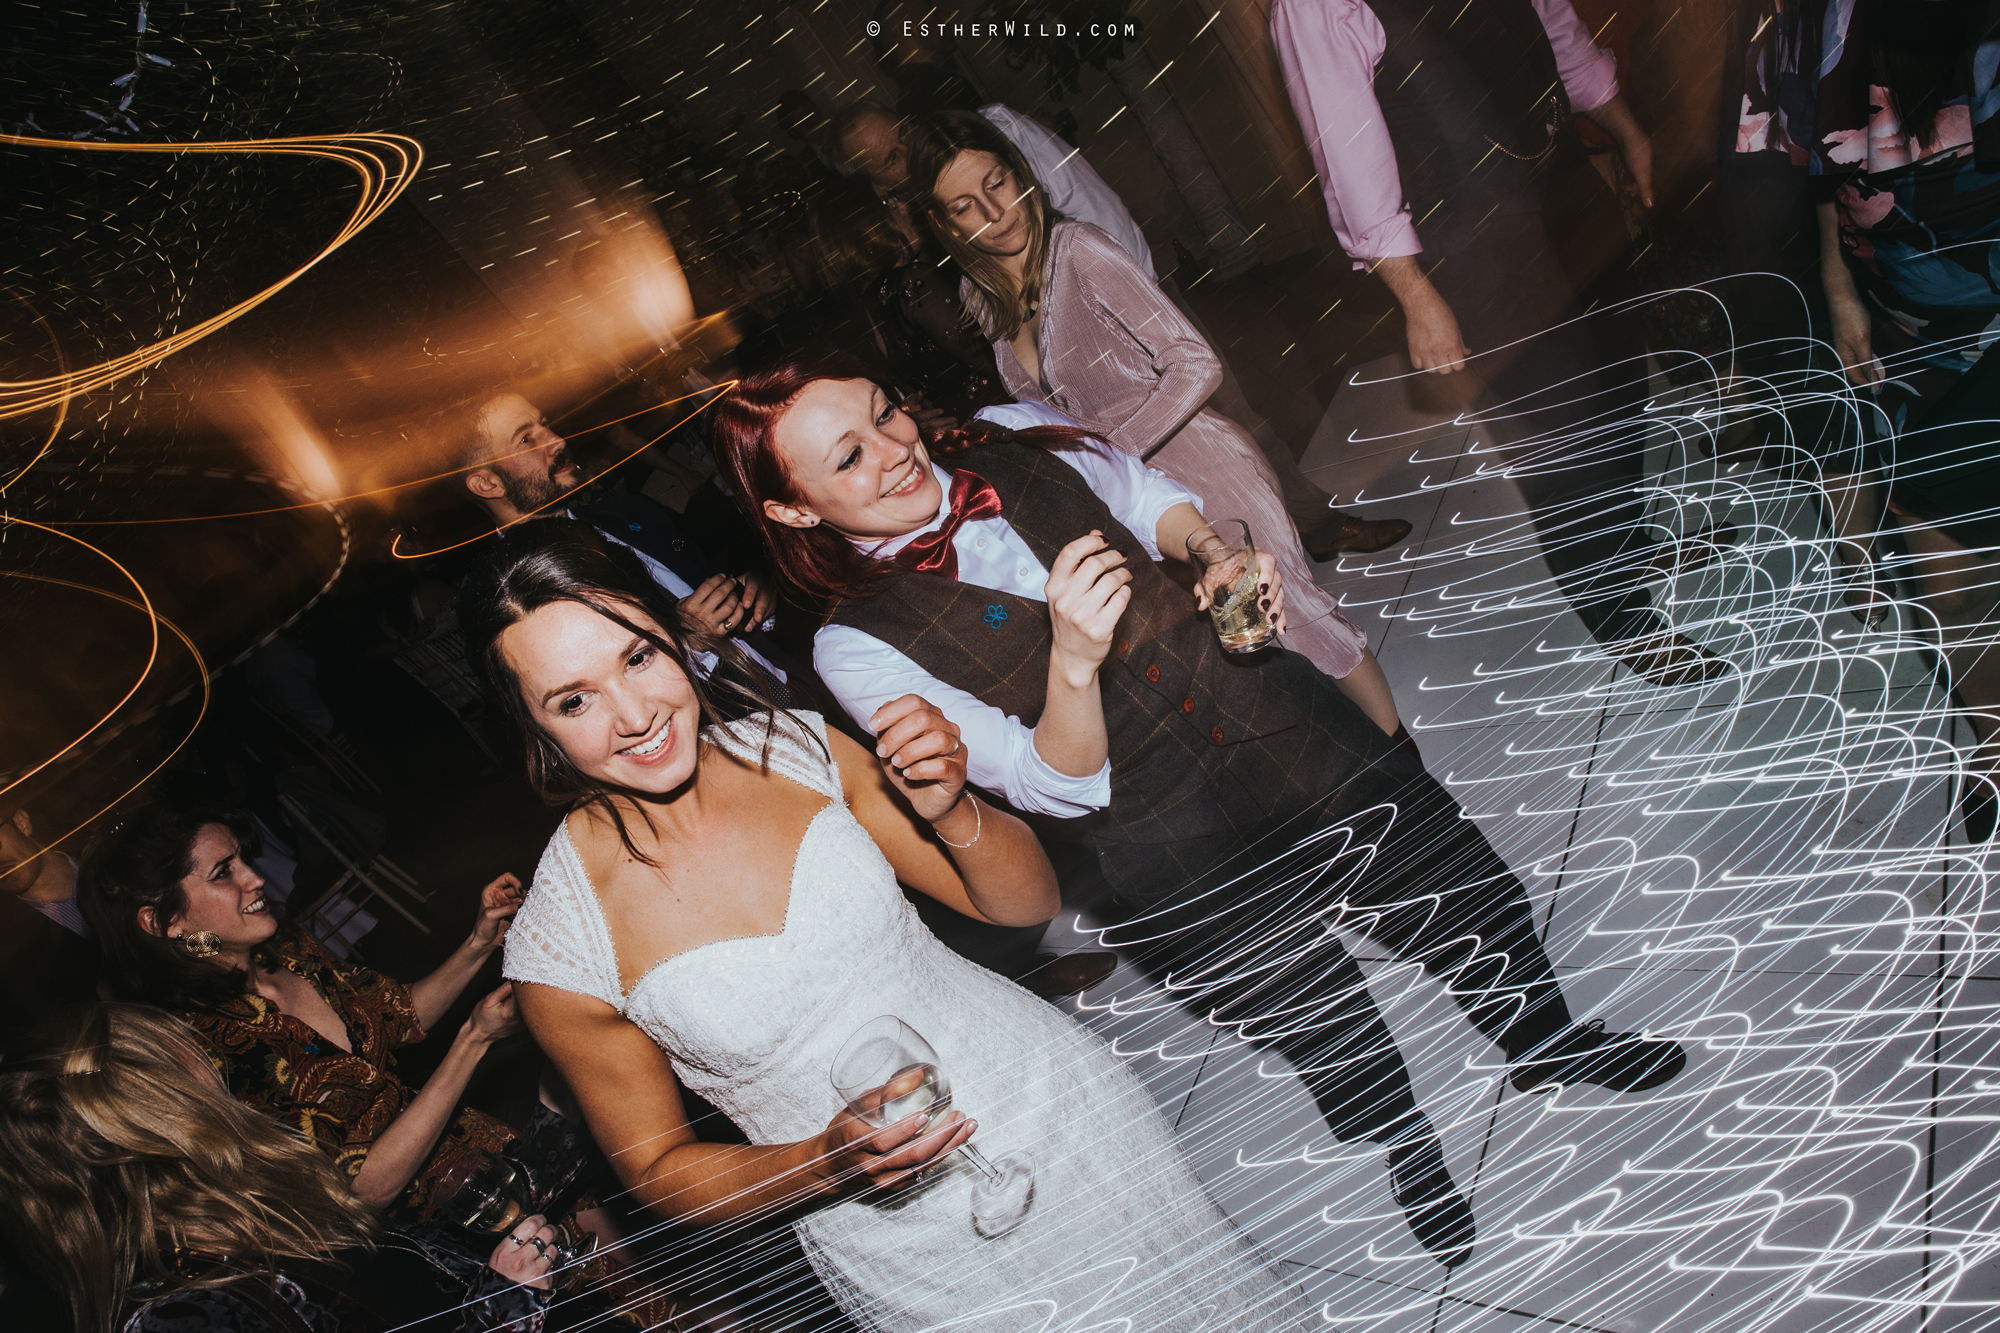 Elms_Barn_Weddings_Suffolk_Photographer_Copyright_Esther_Wild_IMG_3654.jpg